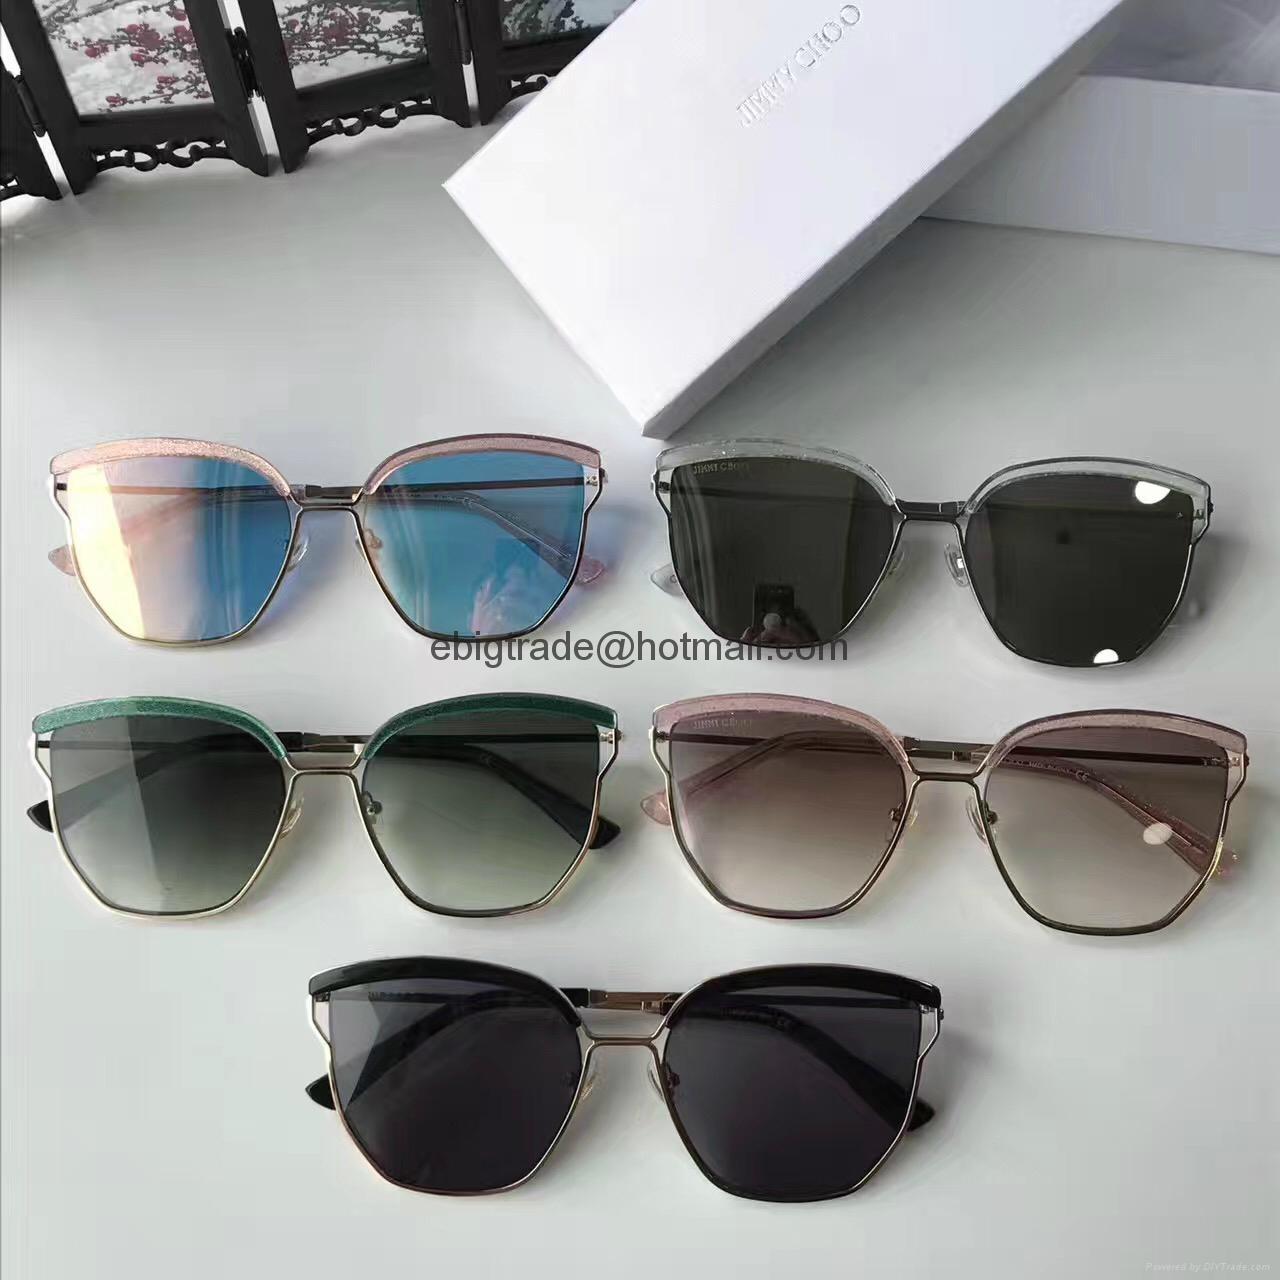 0f5be95ae4c Cheap JIMMY Choo sunglasses for sale Replica JIMMY Choo for women (China  Trading Company .